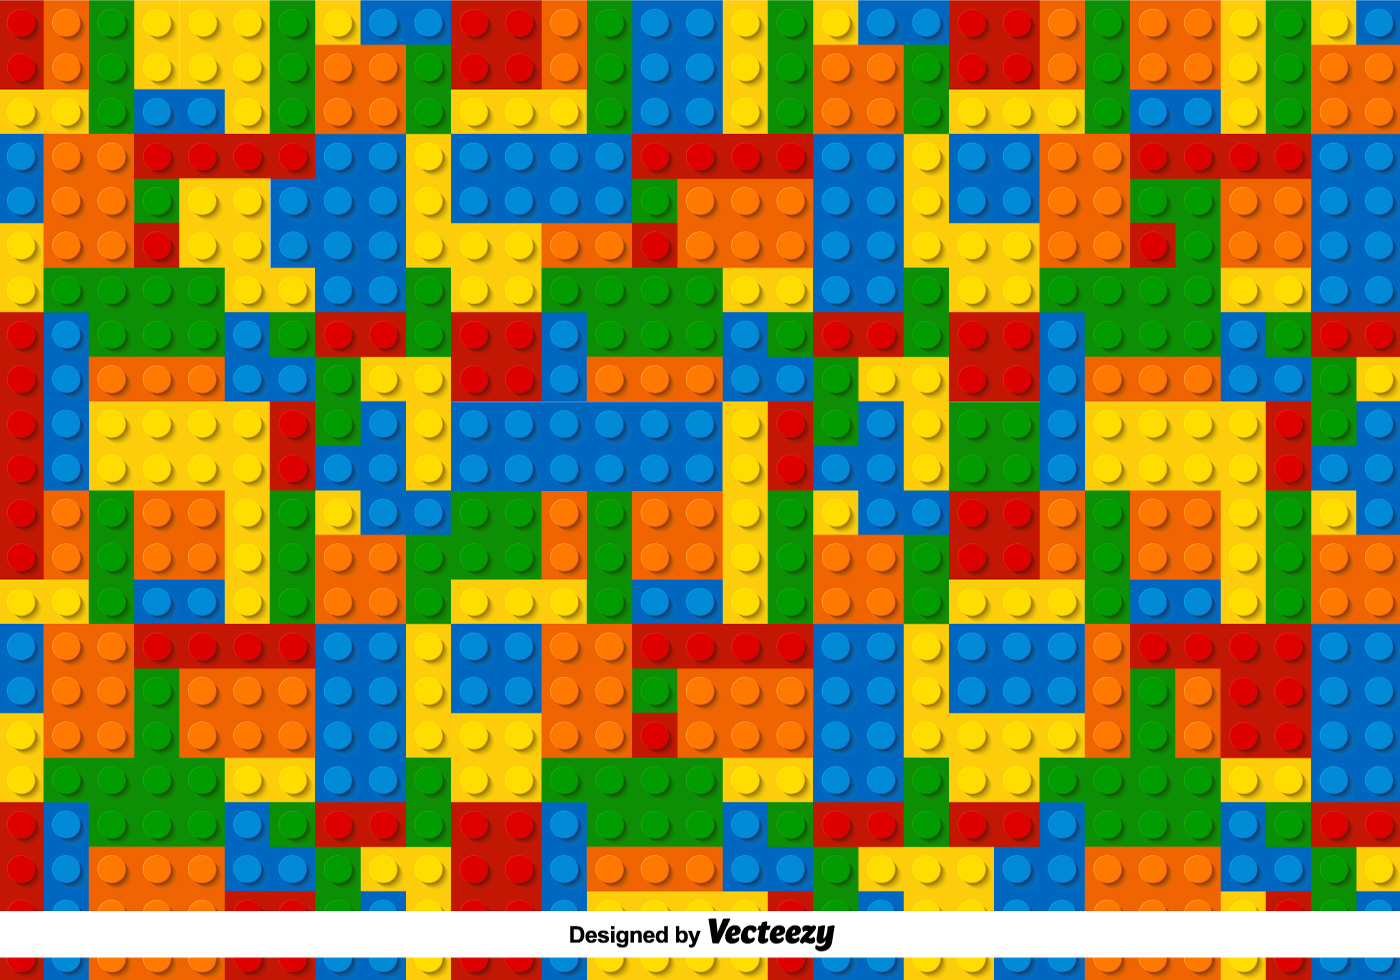 lego free vector art 2938 free downloads rh vecteezy com lego factory lego victorian time